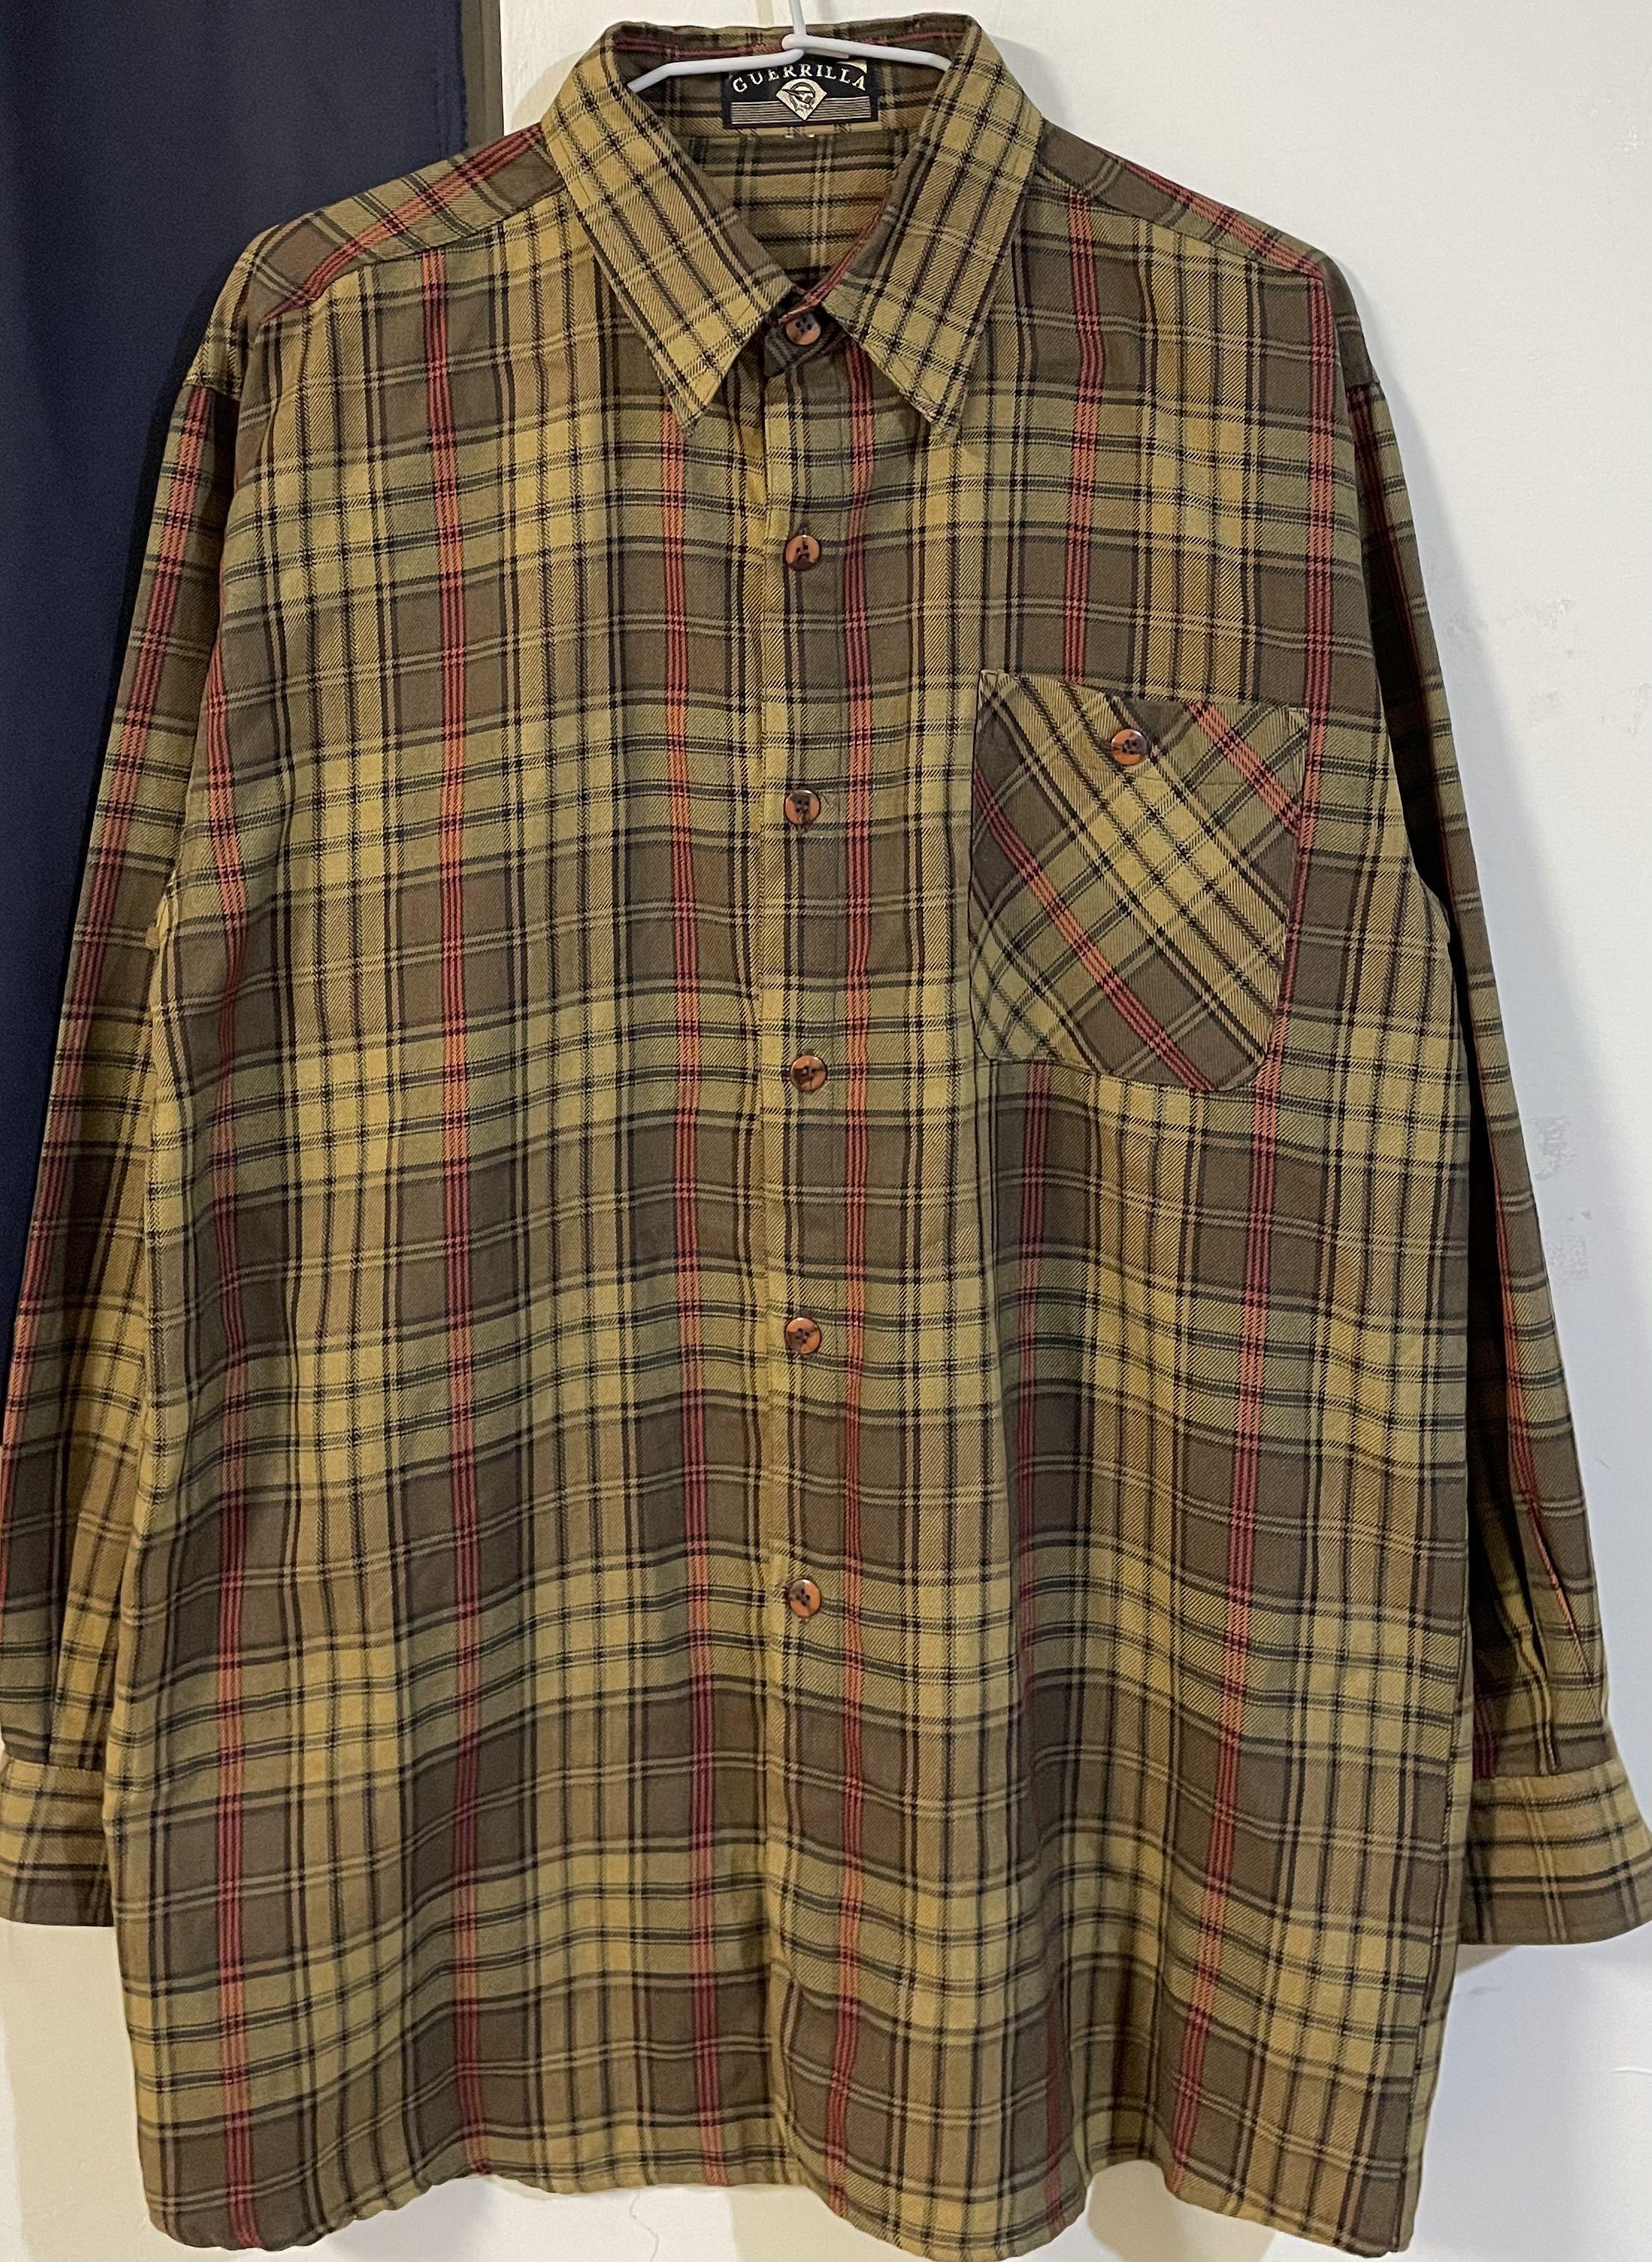 Vintage 古著格紋襯衫👔